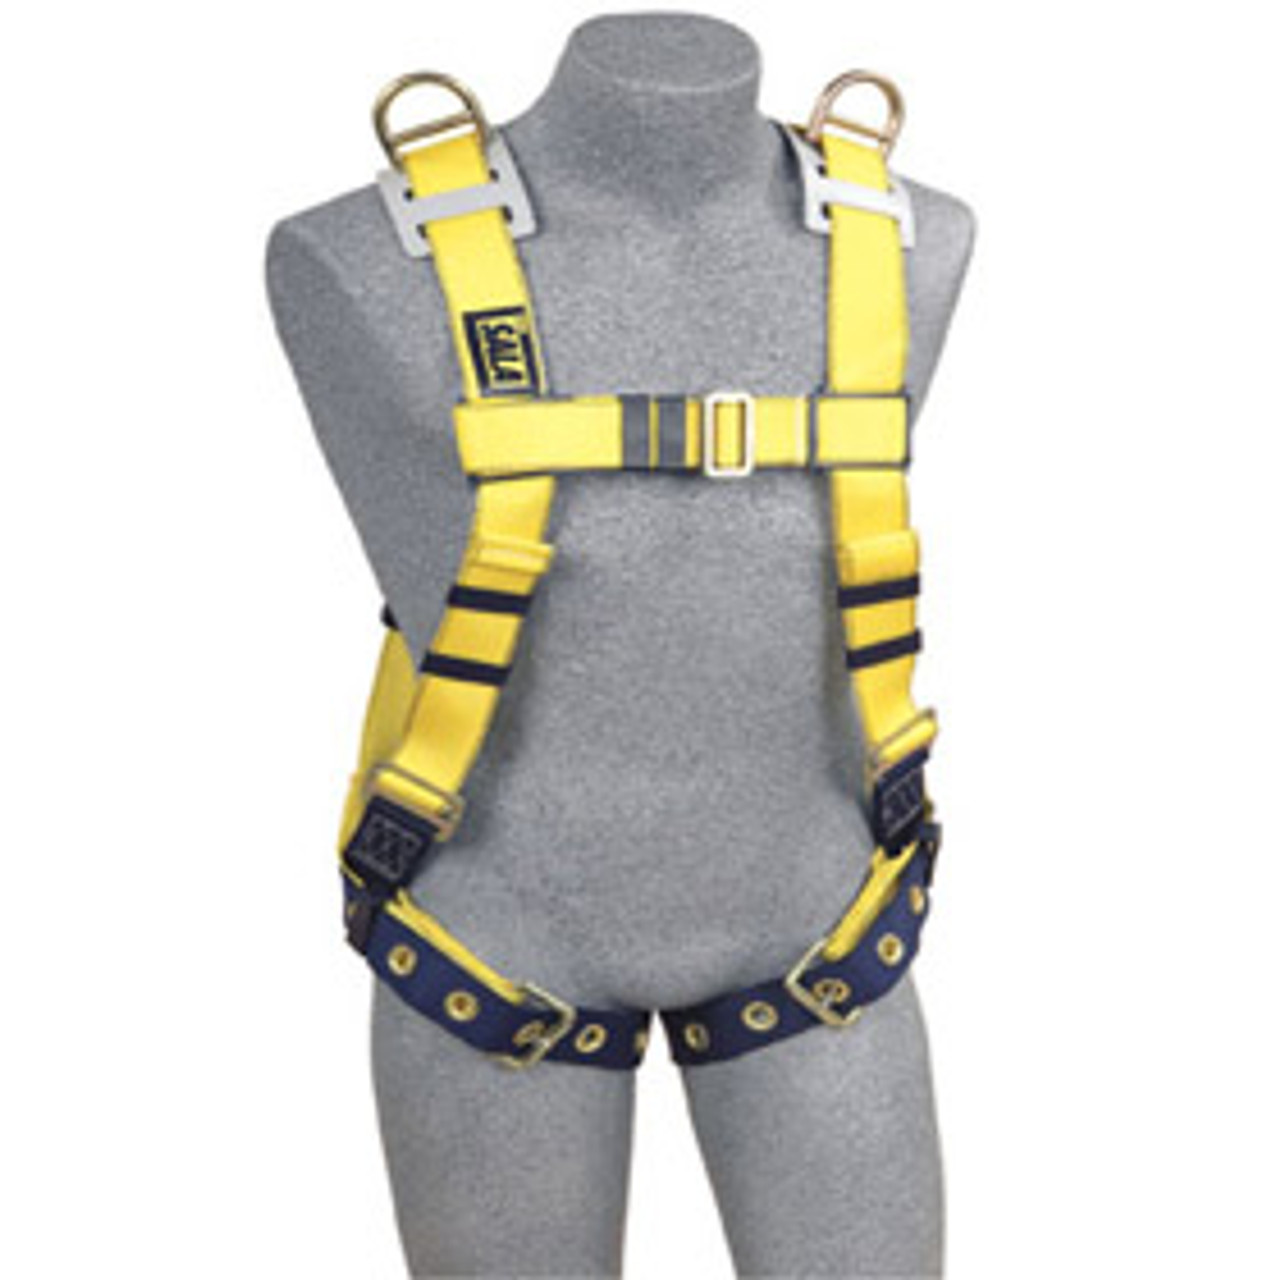 Delta II Vest-Style Harness, Retrieval